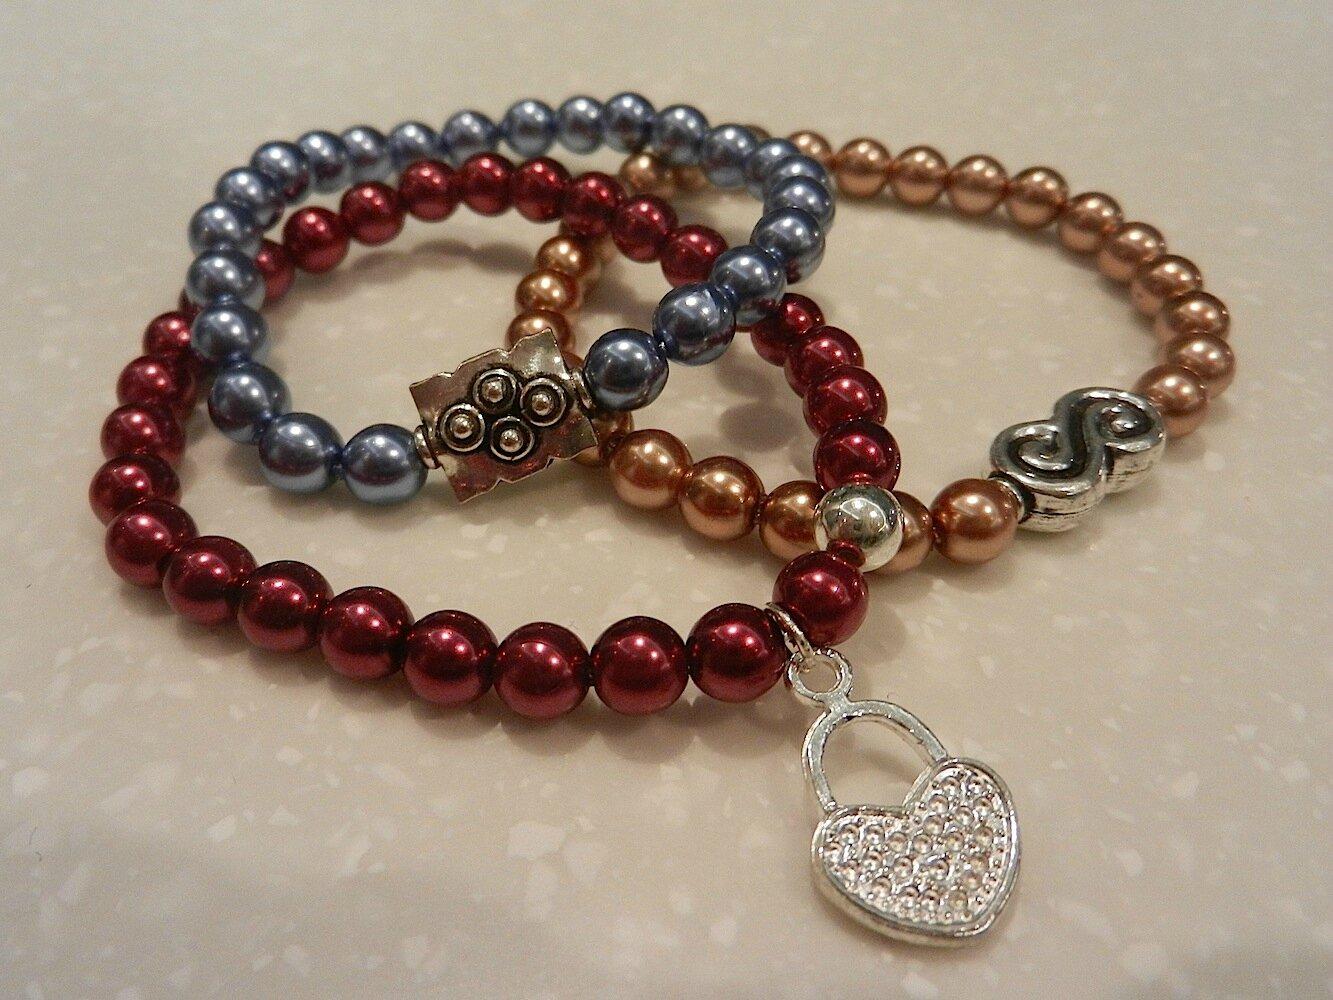 bracelets perles de verre peintes, perles metalliques, élastique